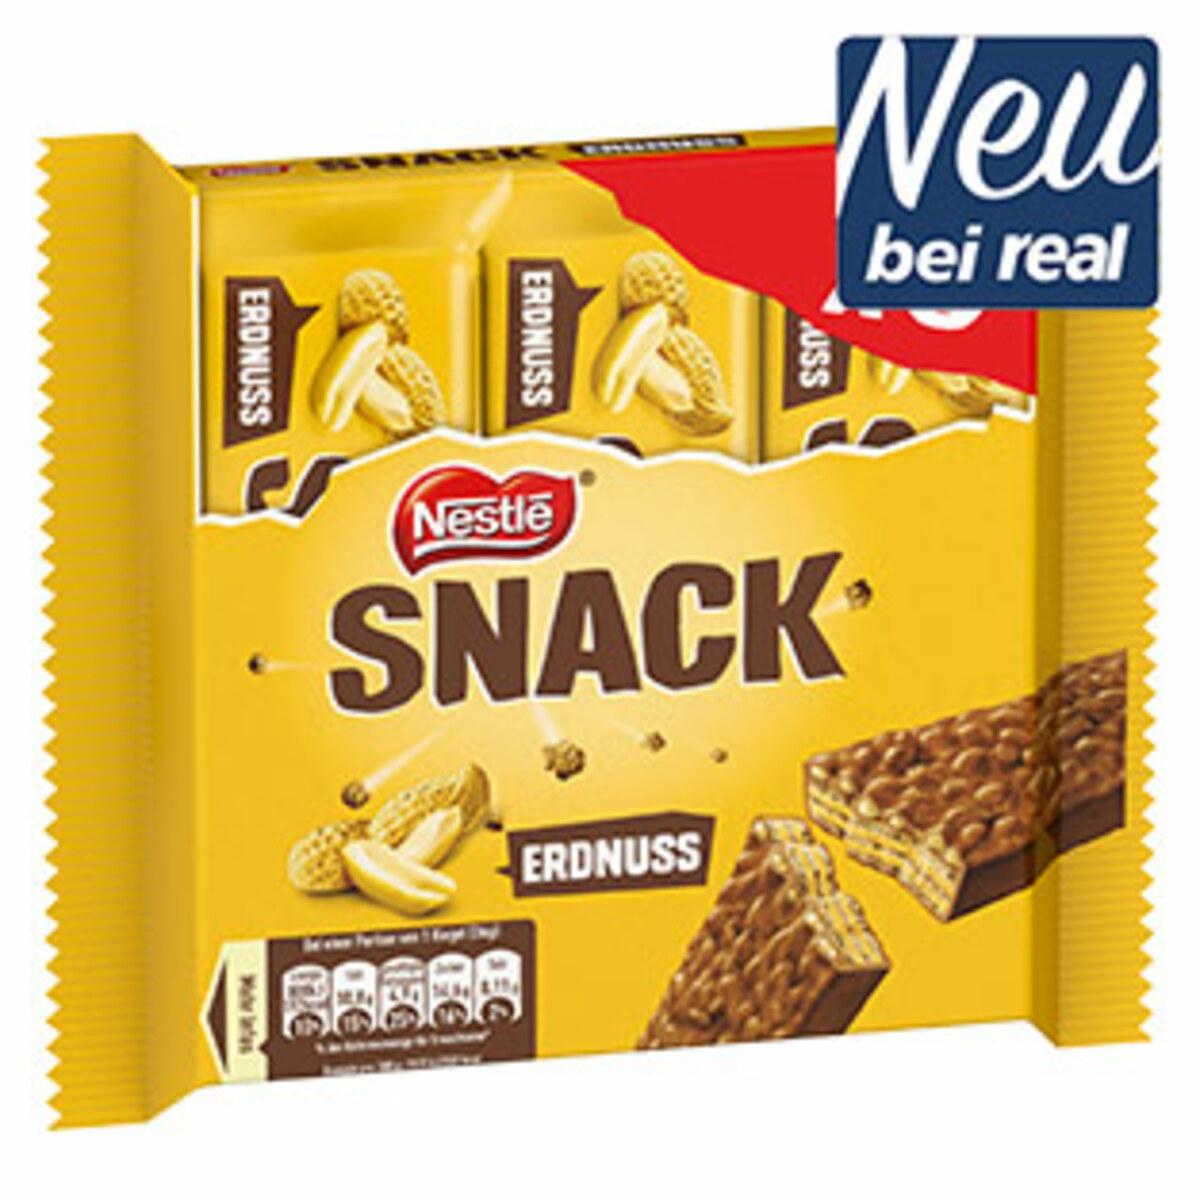 Nestle Erdnuss Snack